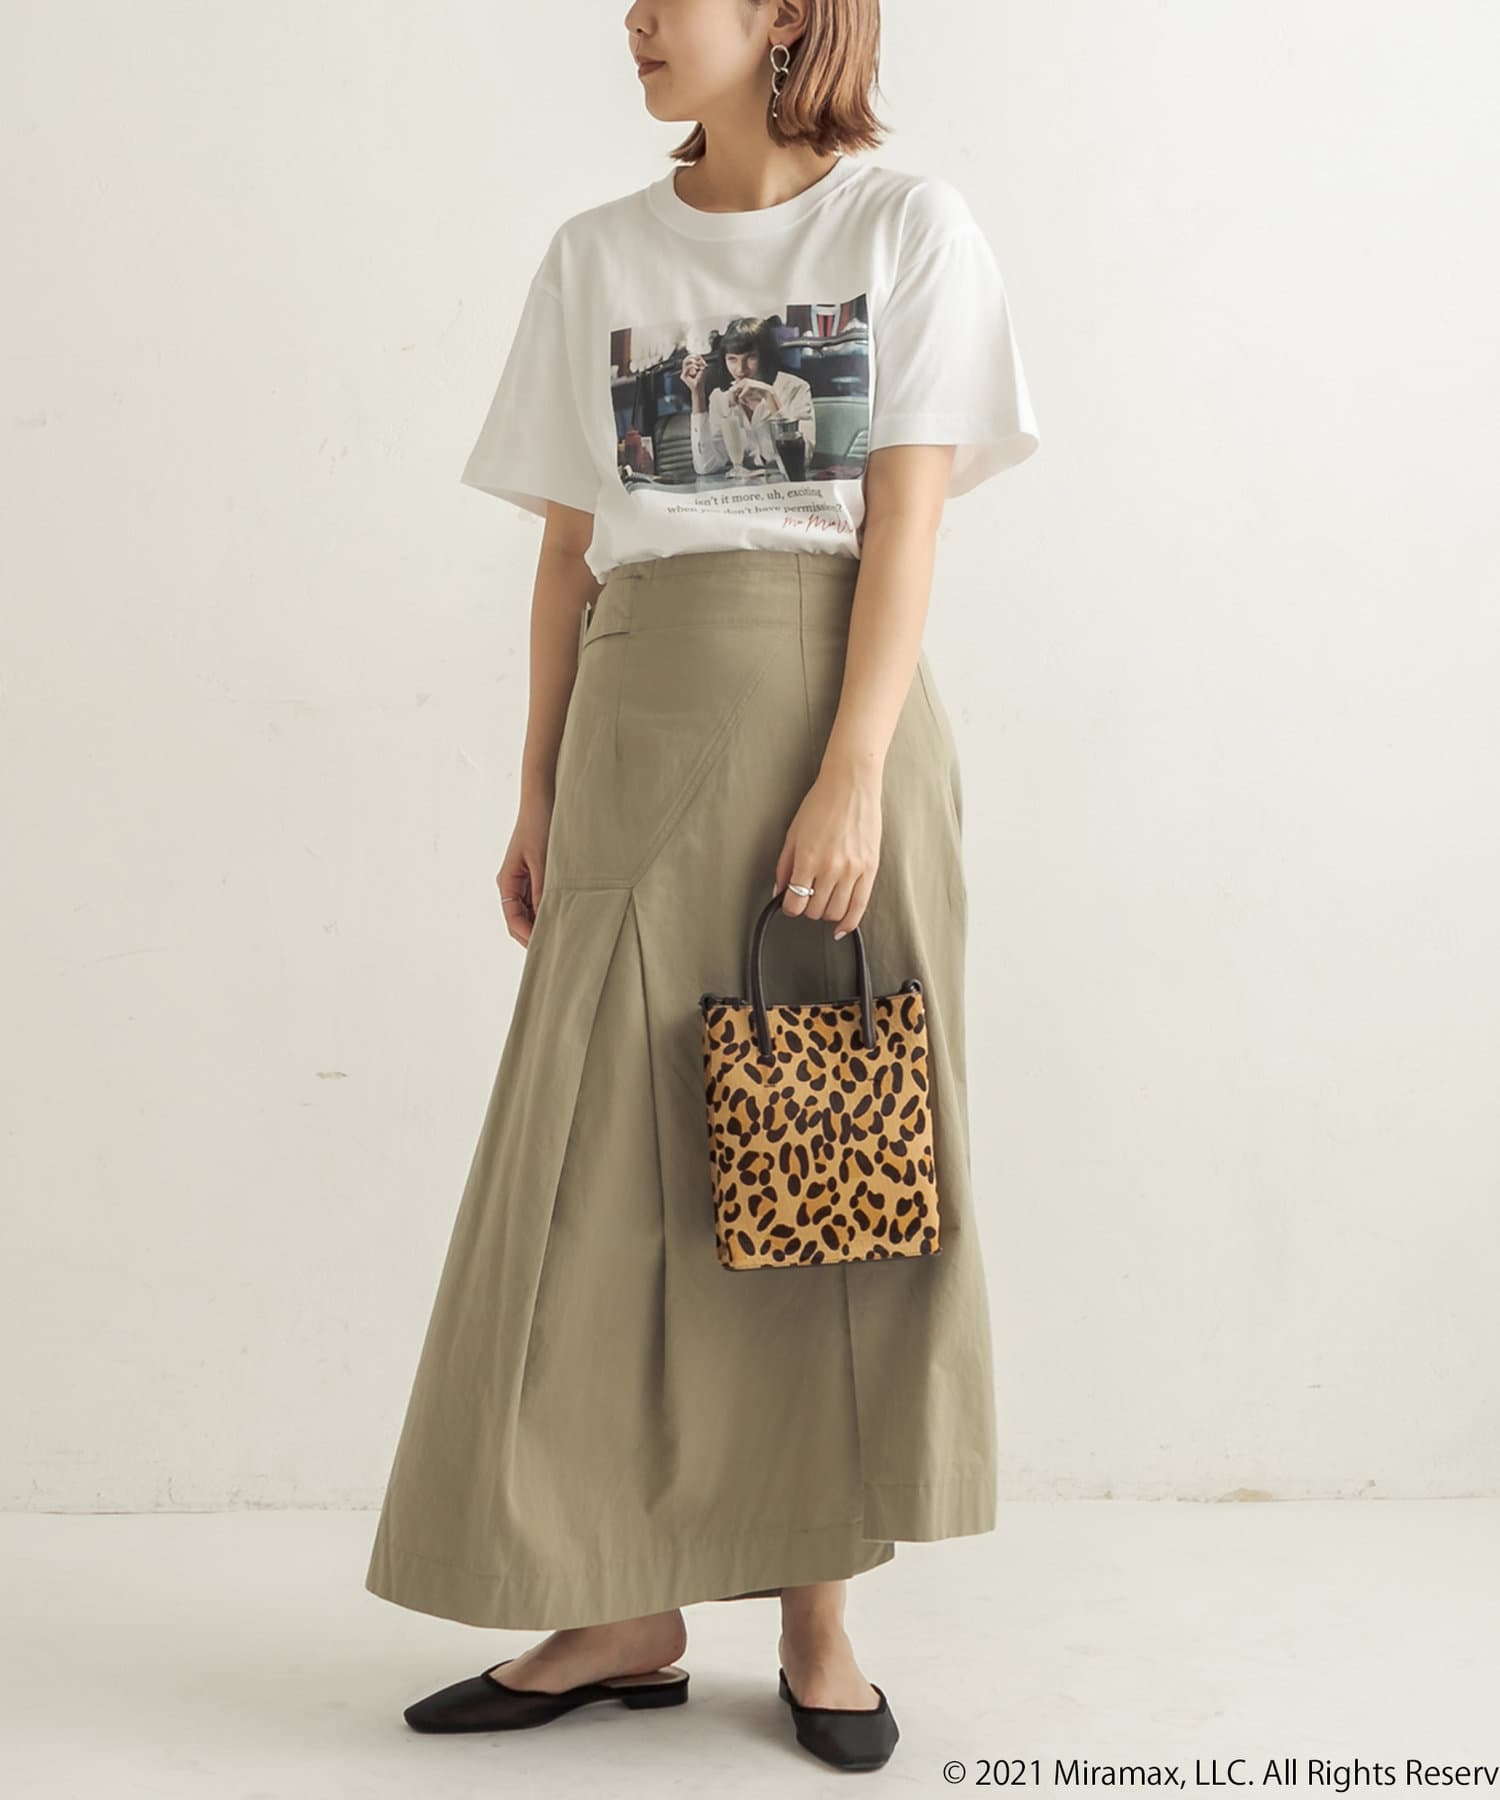 CAPRICIEUX LE'MAGE(カプリシュレマージュ) 【GOOD ROCK SPEED】PULPFICTIONフォトシャツ